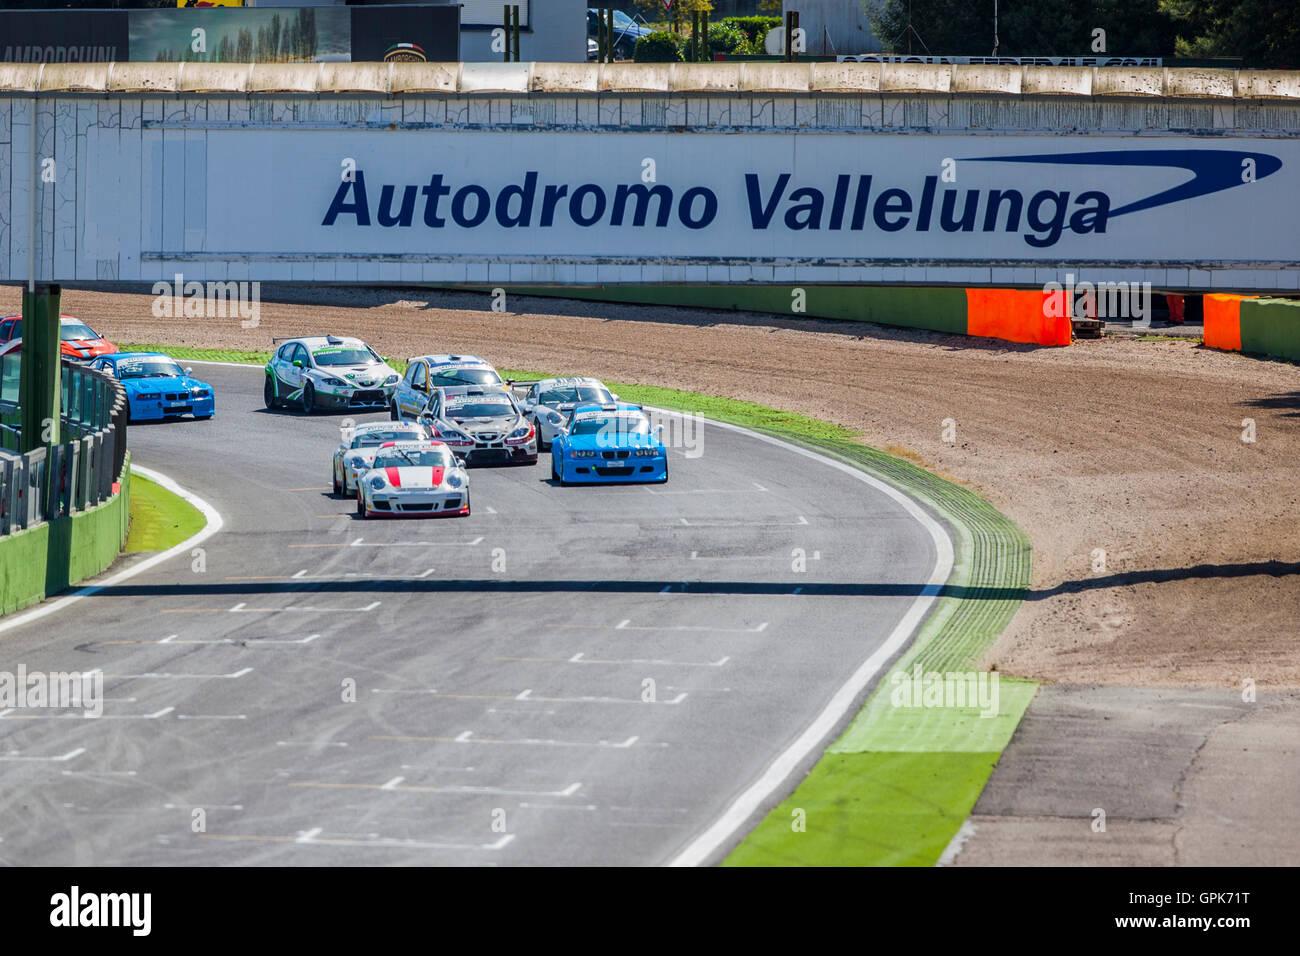 Circuito Vallelunga : Automobilismo carrera cup iaquinta prova a stupire a vallelunga